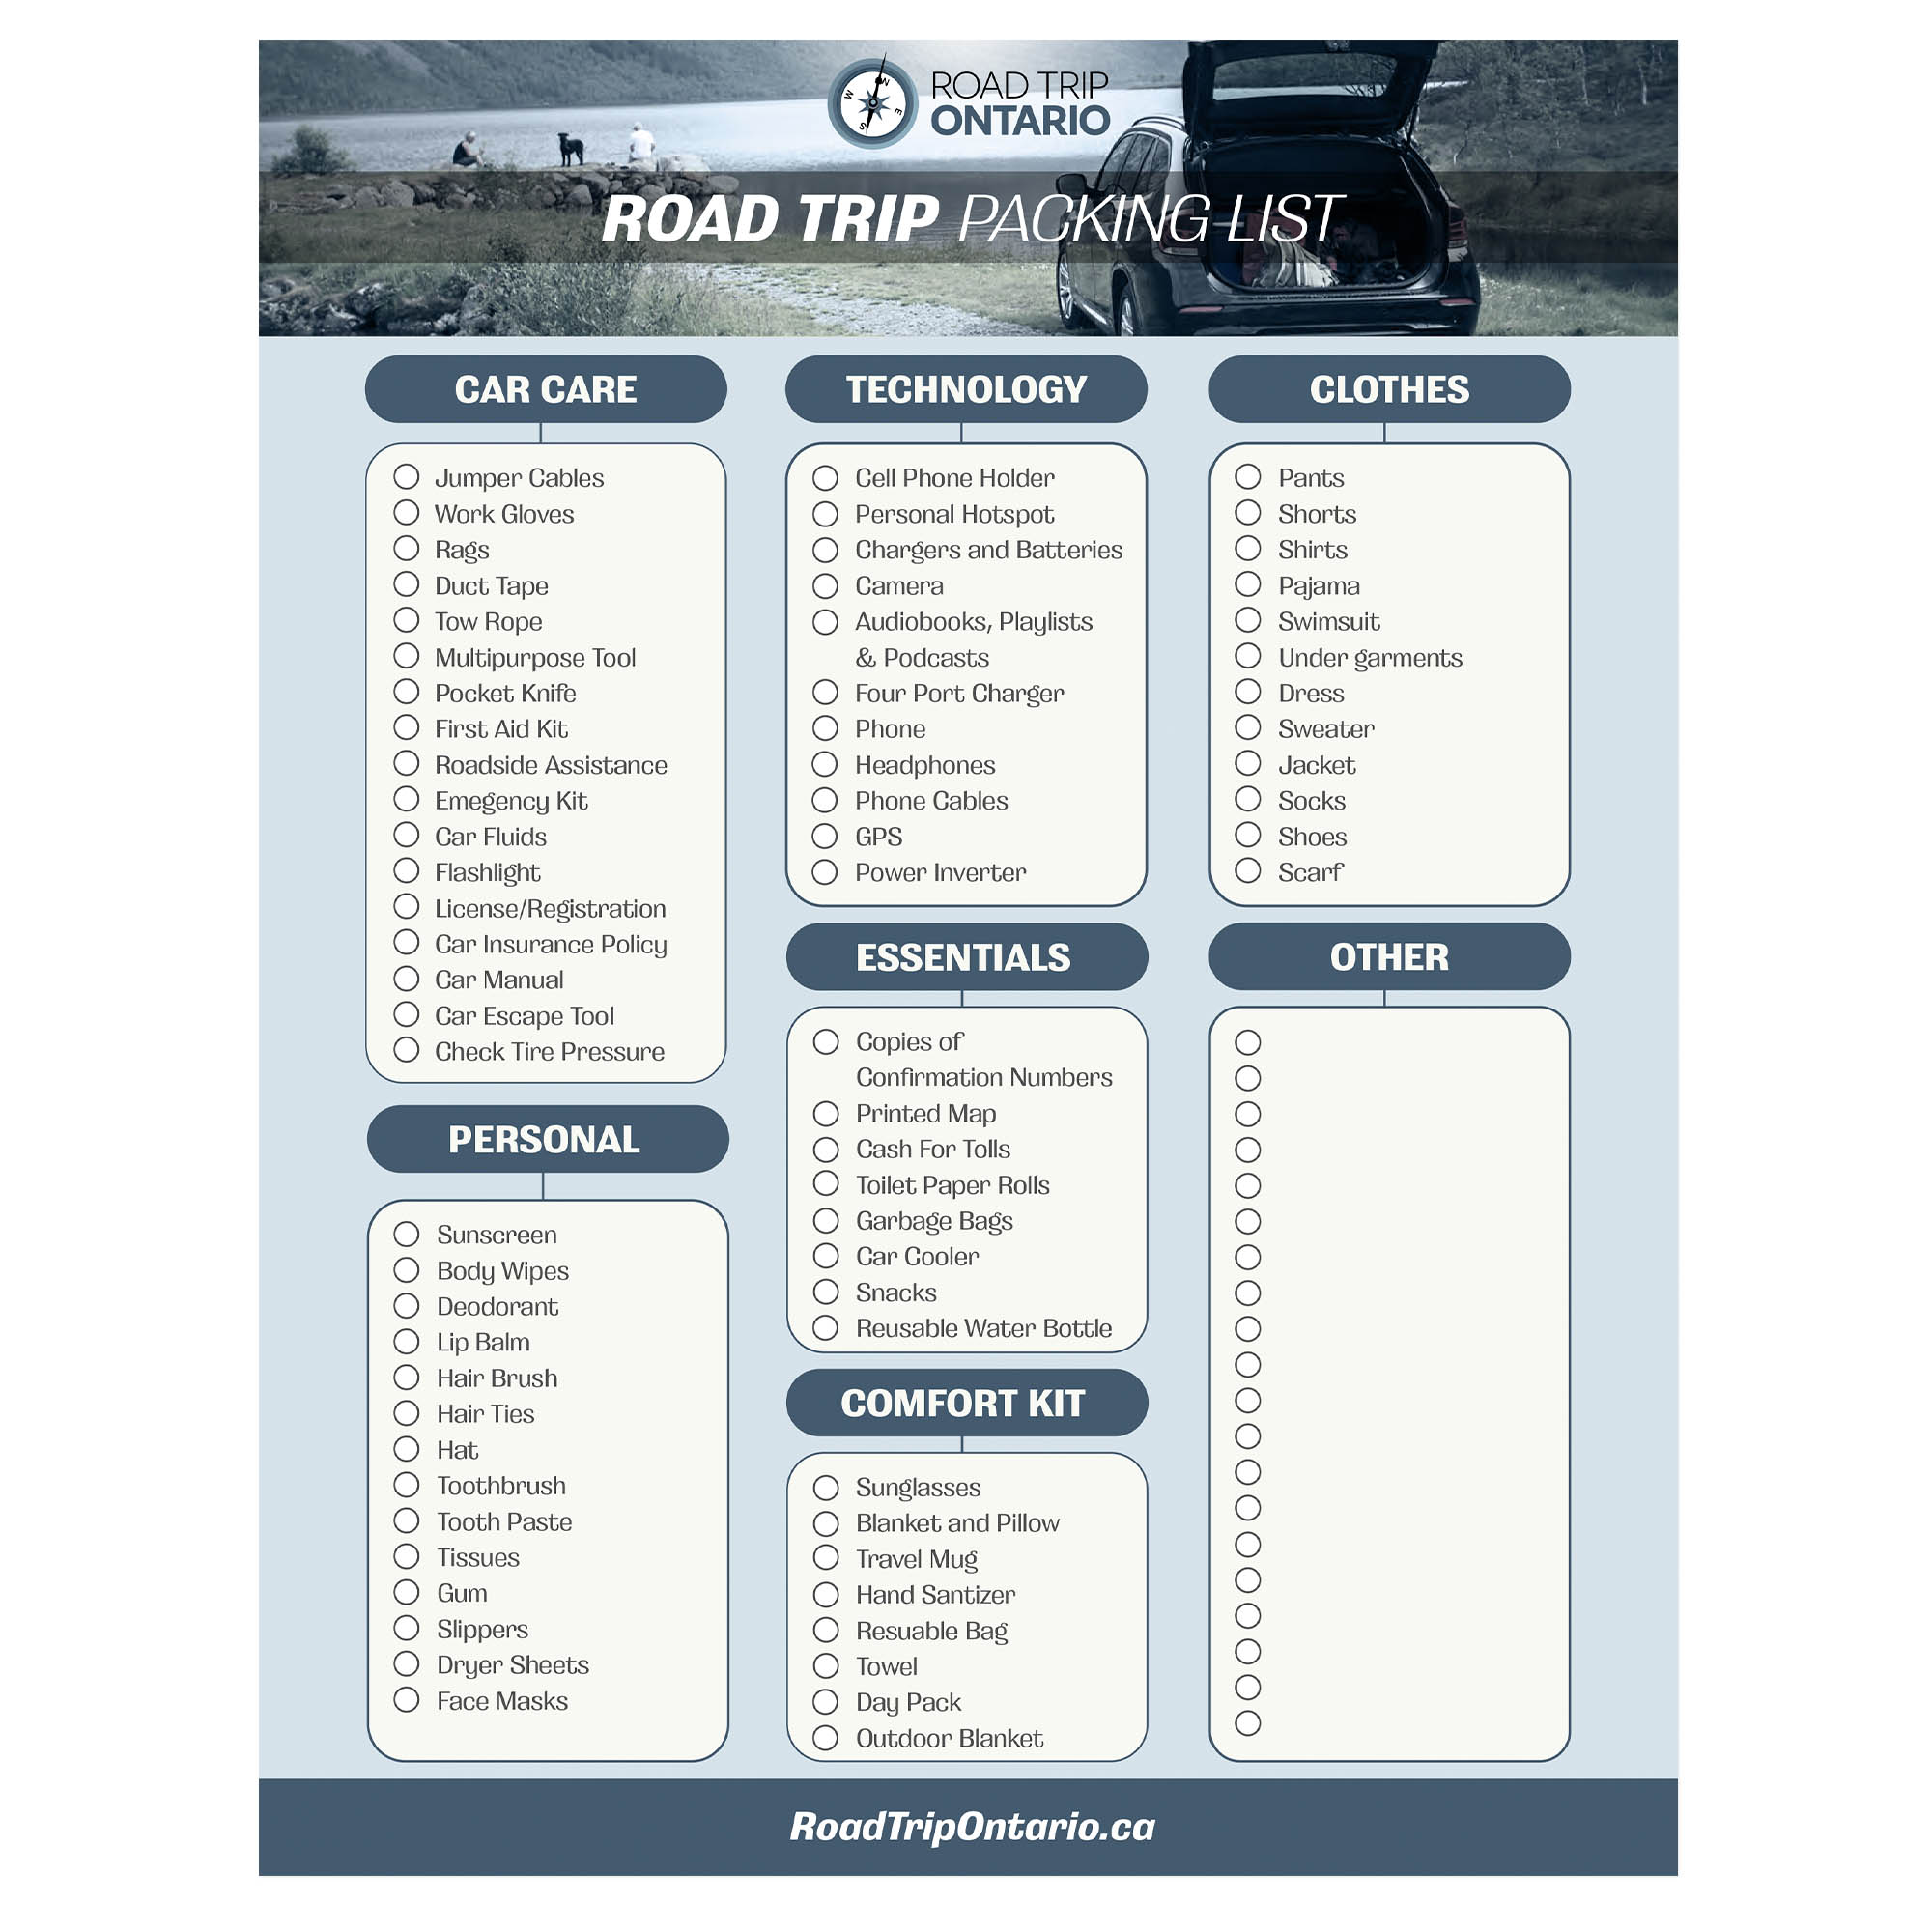 Road Trip Ontario - Road Trip Packing List - Lead Magnets